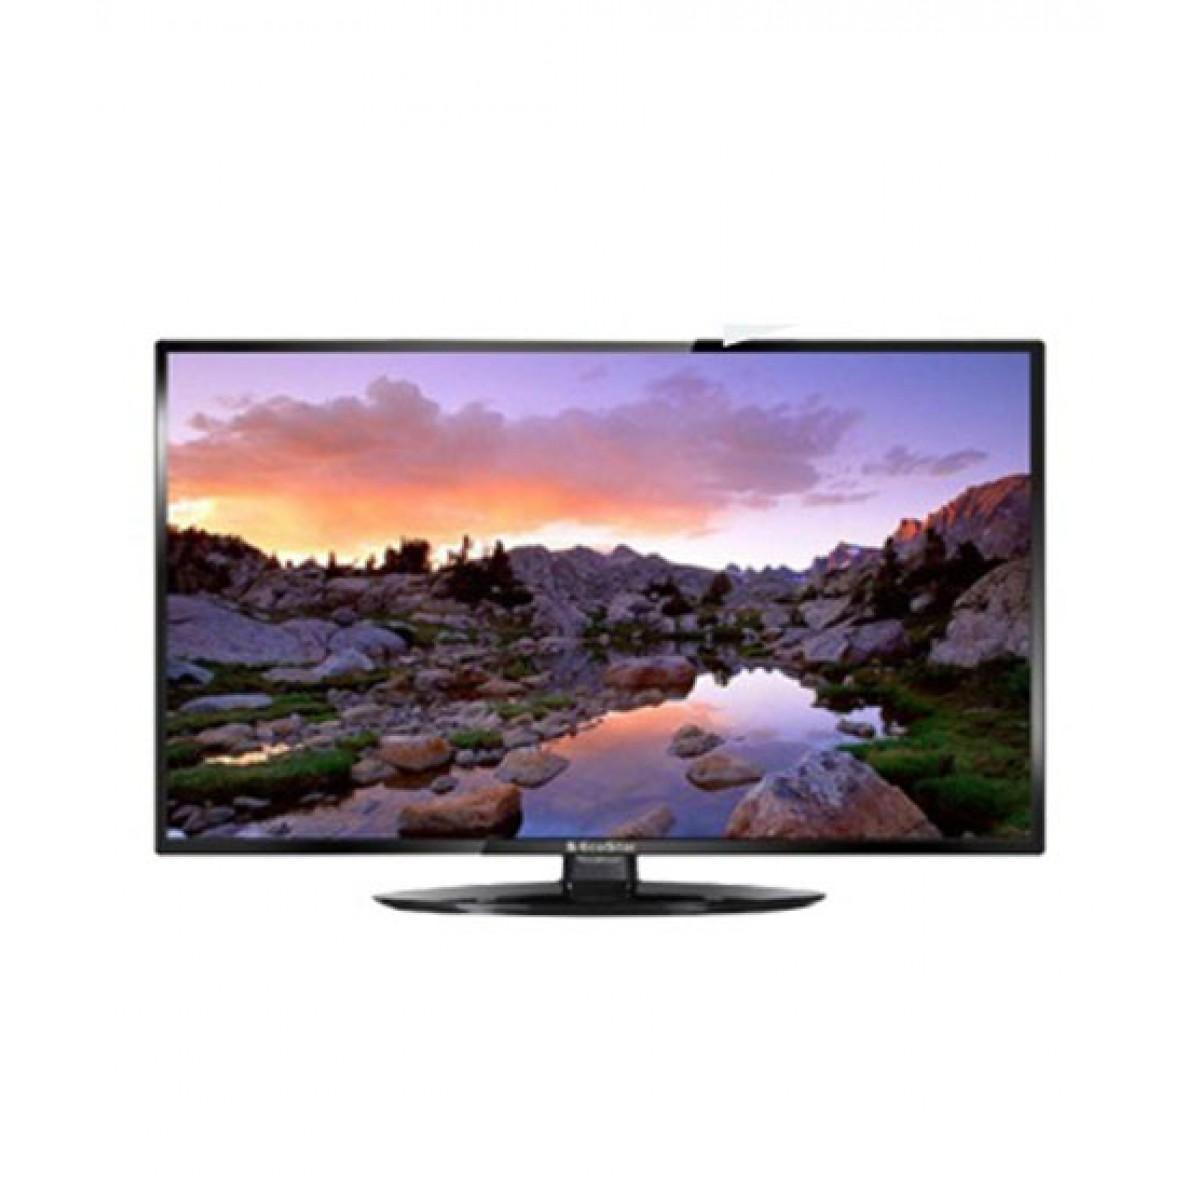 EcoStar 49 Inch 49U571 LED TV